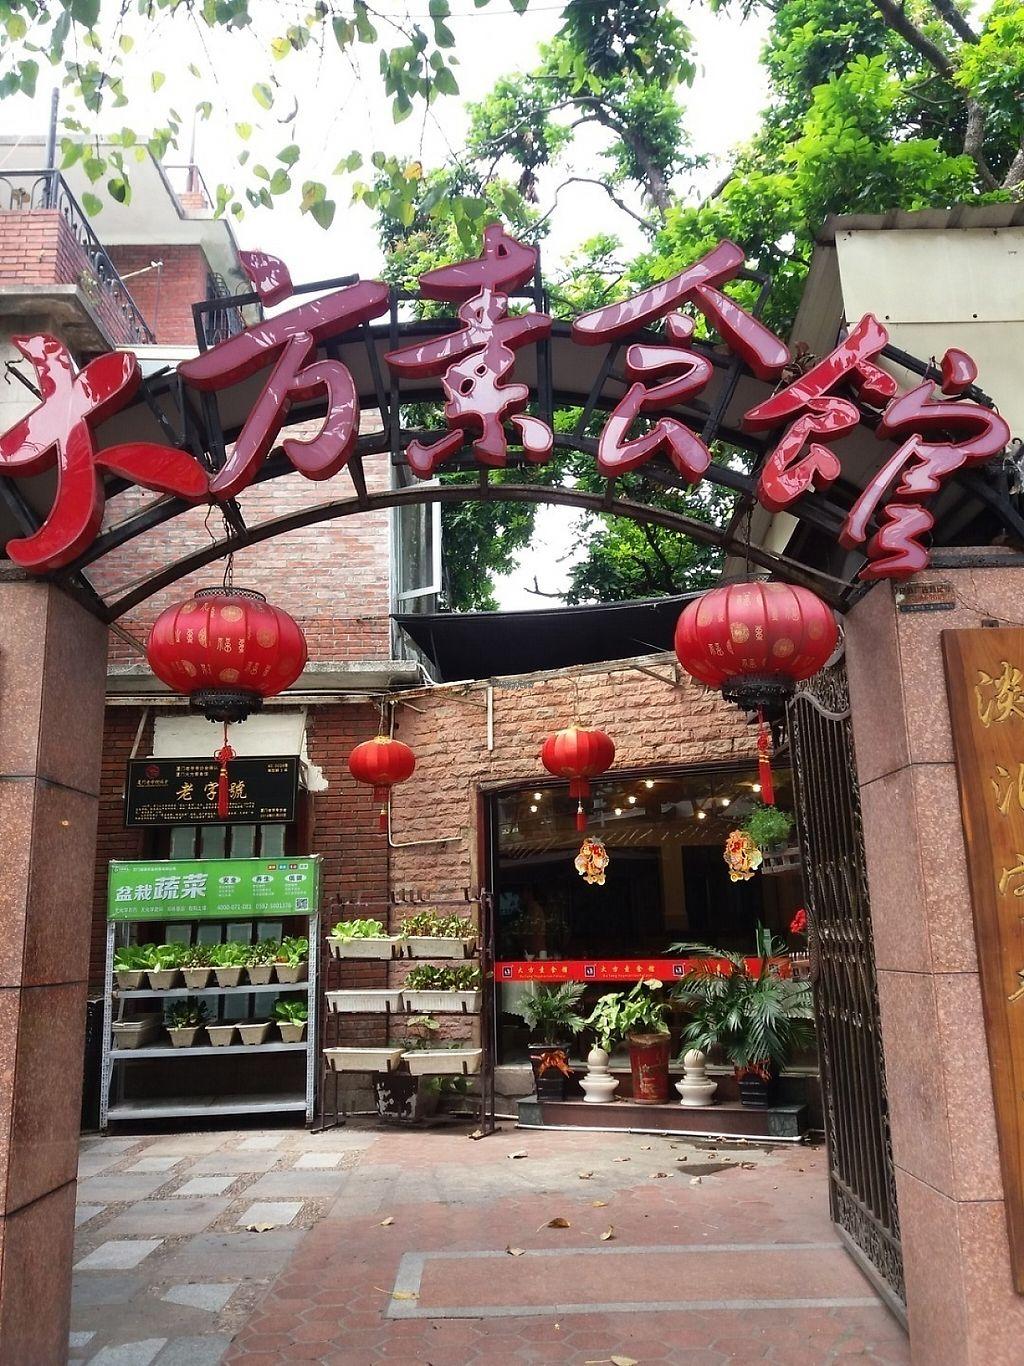 "Photo of Da Fang Vegetarian  by <a href=""/members/profile/huawhenua"">huawhenua</a> <br/>Exterior of Da Fang Vegetarian Palace <br/> April 26, 2017  - <a href='/contact/abuse/image/18463/252735'>Report</a>"